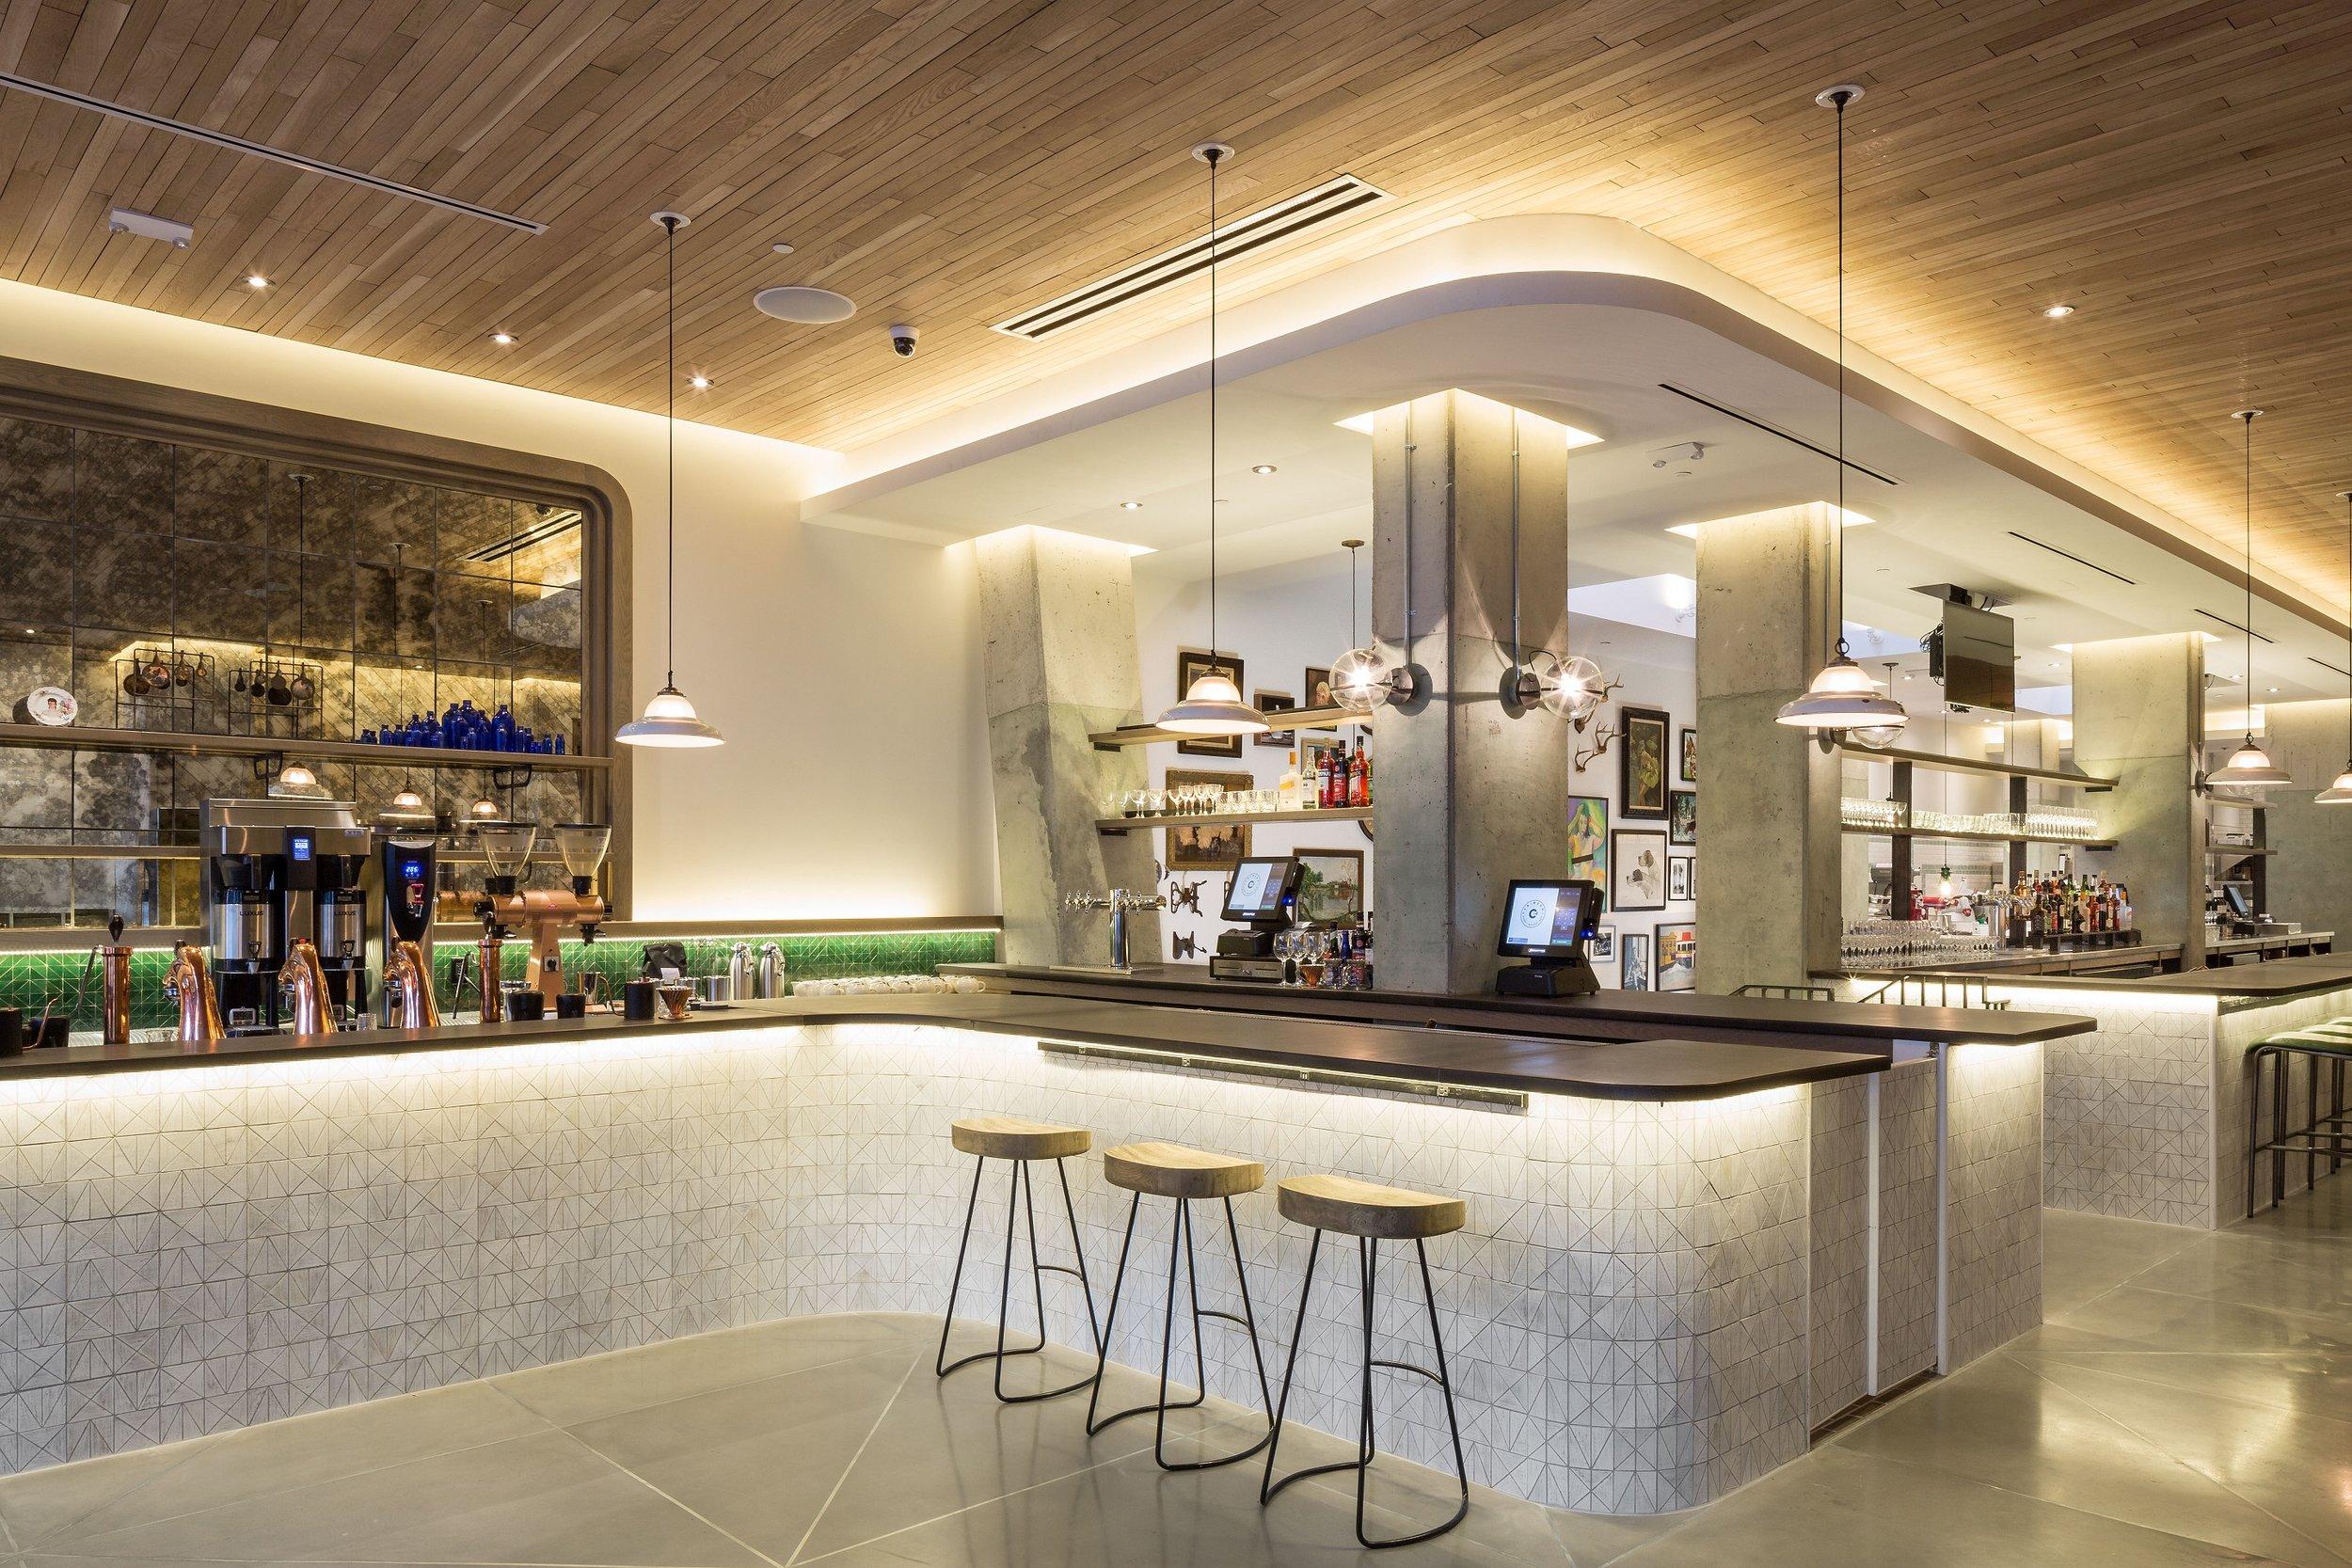 studio-saint-hotels-pod-hotel-crimson-diner-washington-dc-3